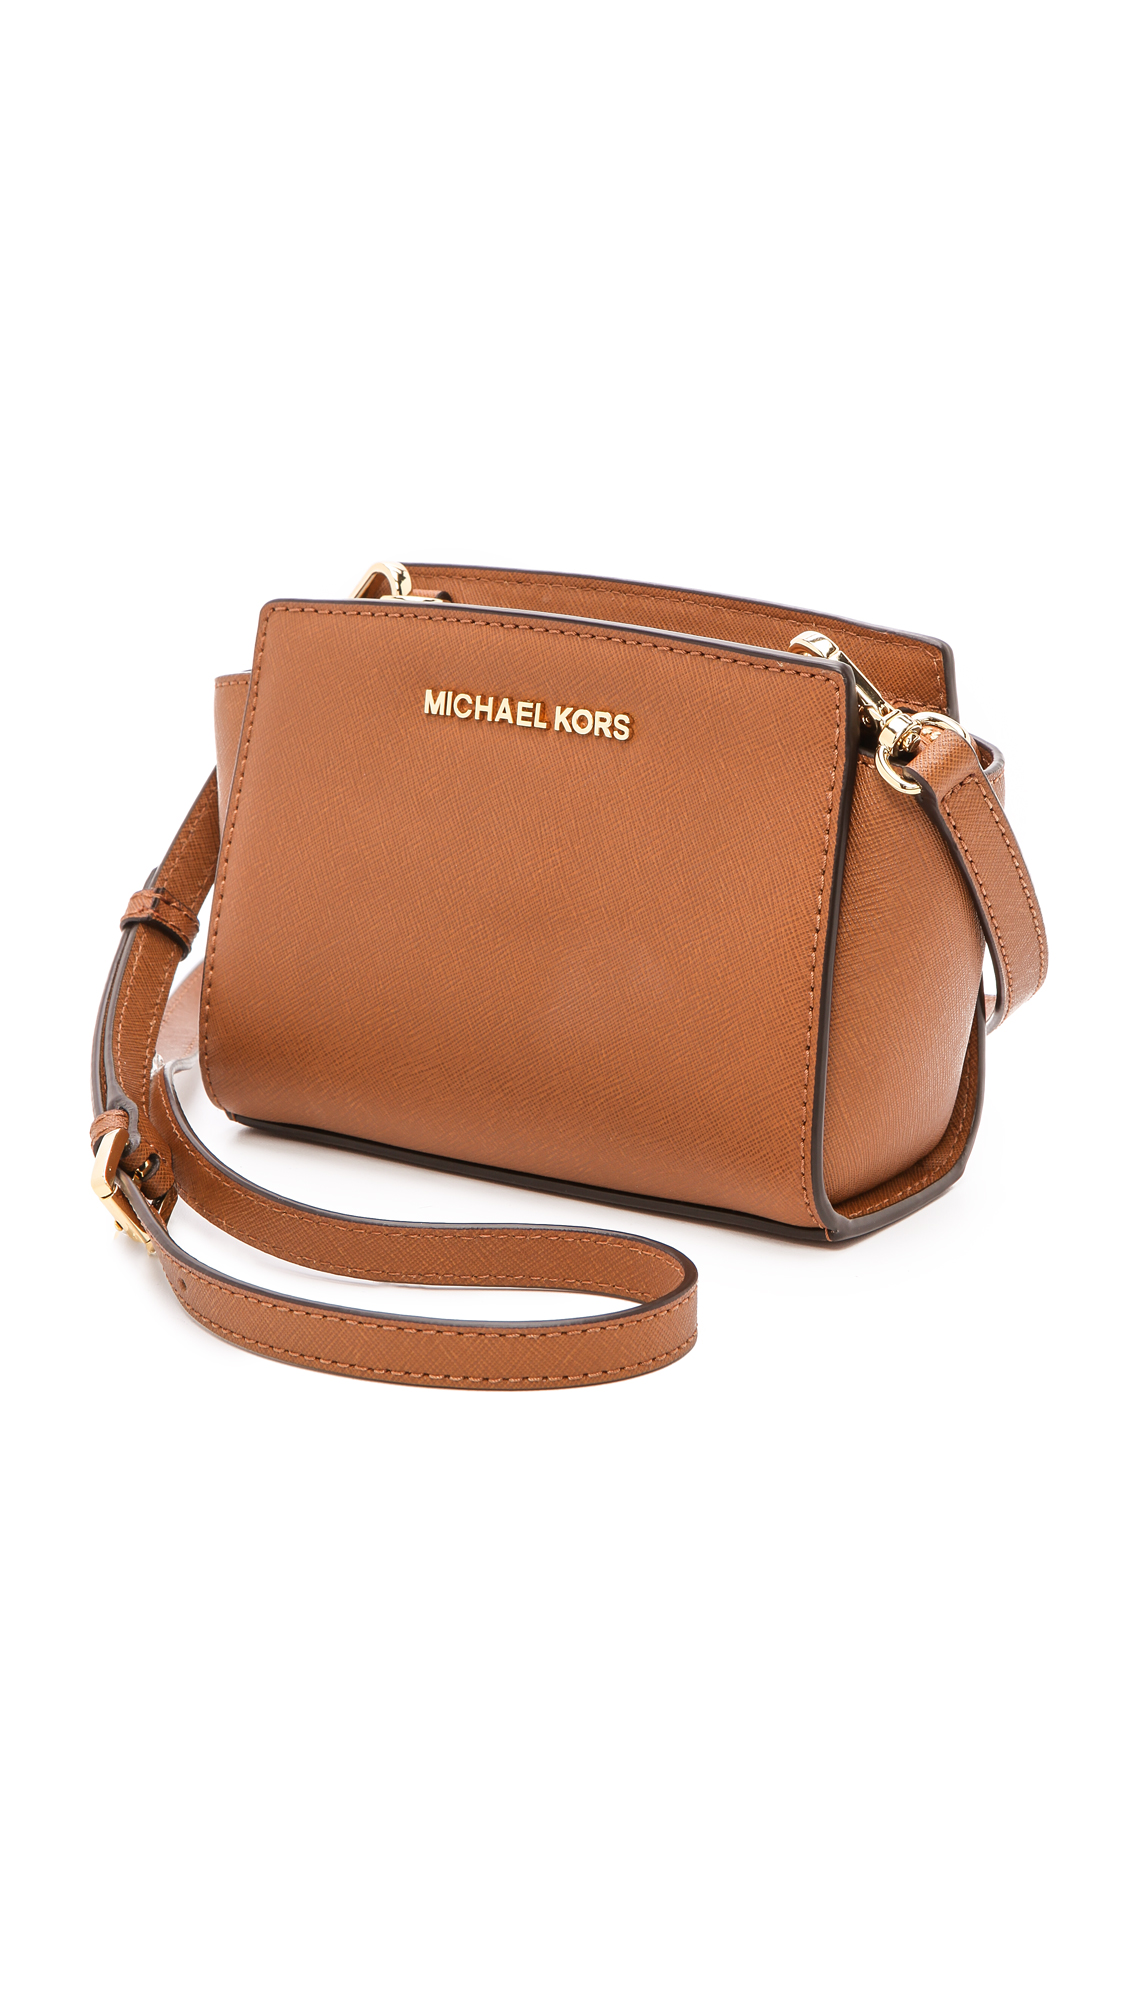 3cad8b683a07 MICHAEL Michael Kors Selma Mini Messenger Bag